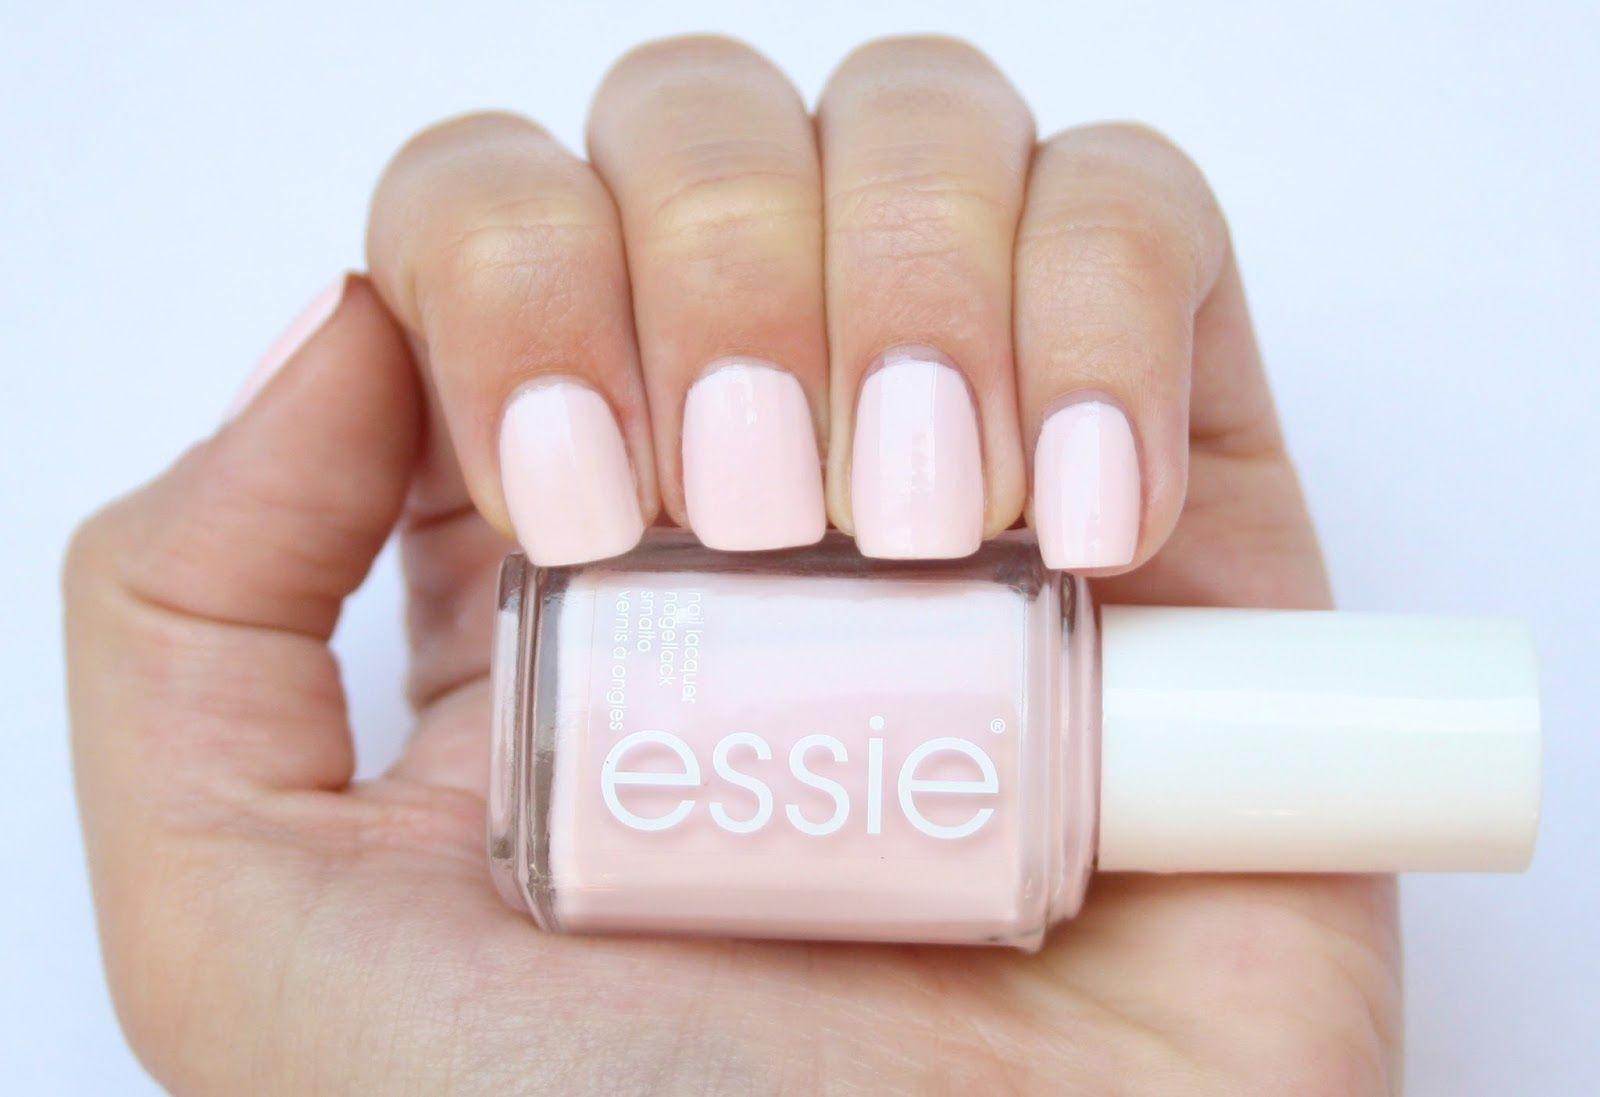 essie fiji nail polish | Nails and accessories | Pinterest | Make up ...